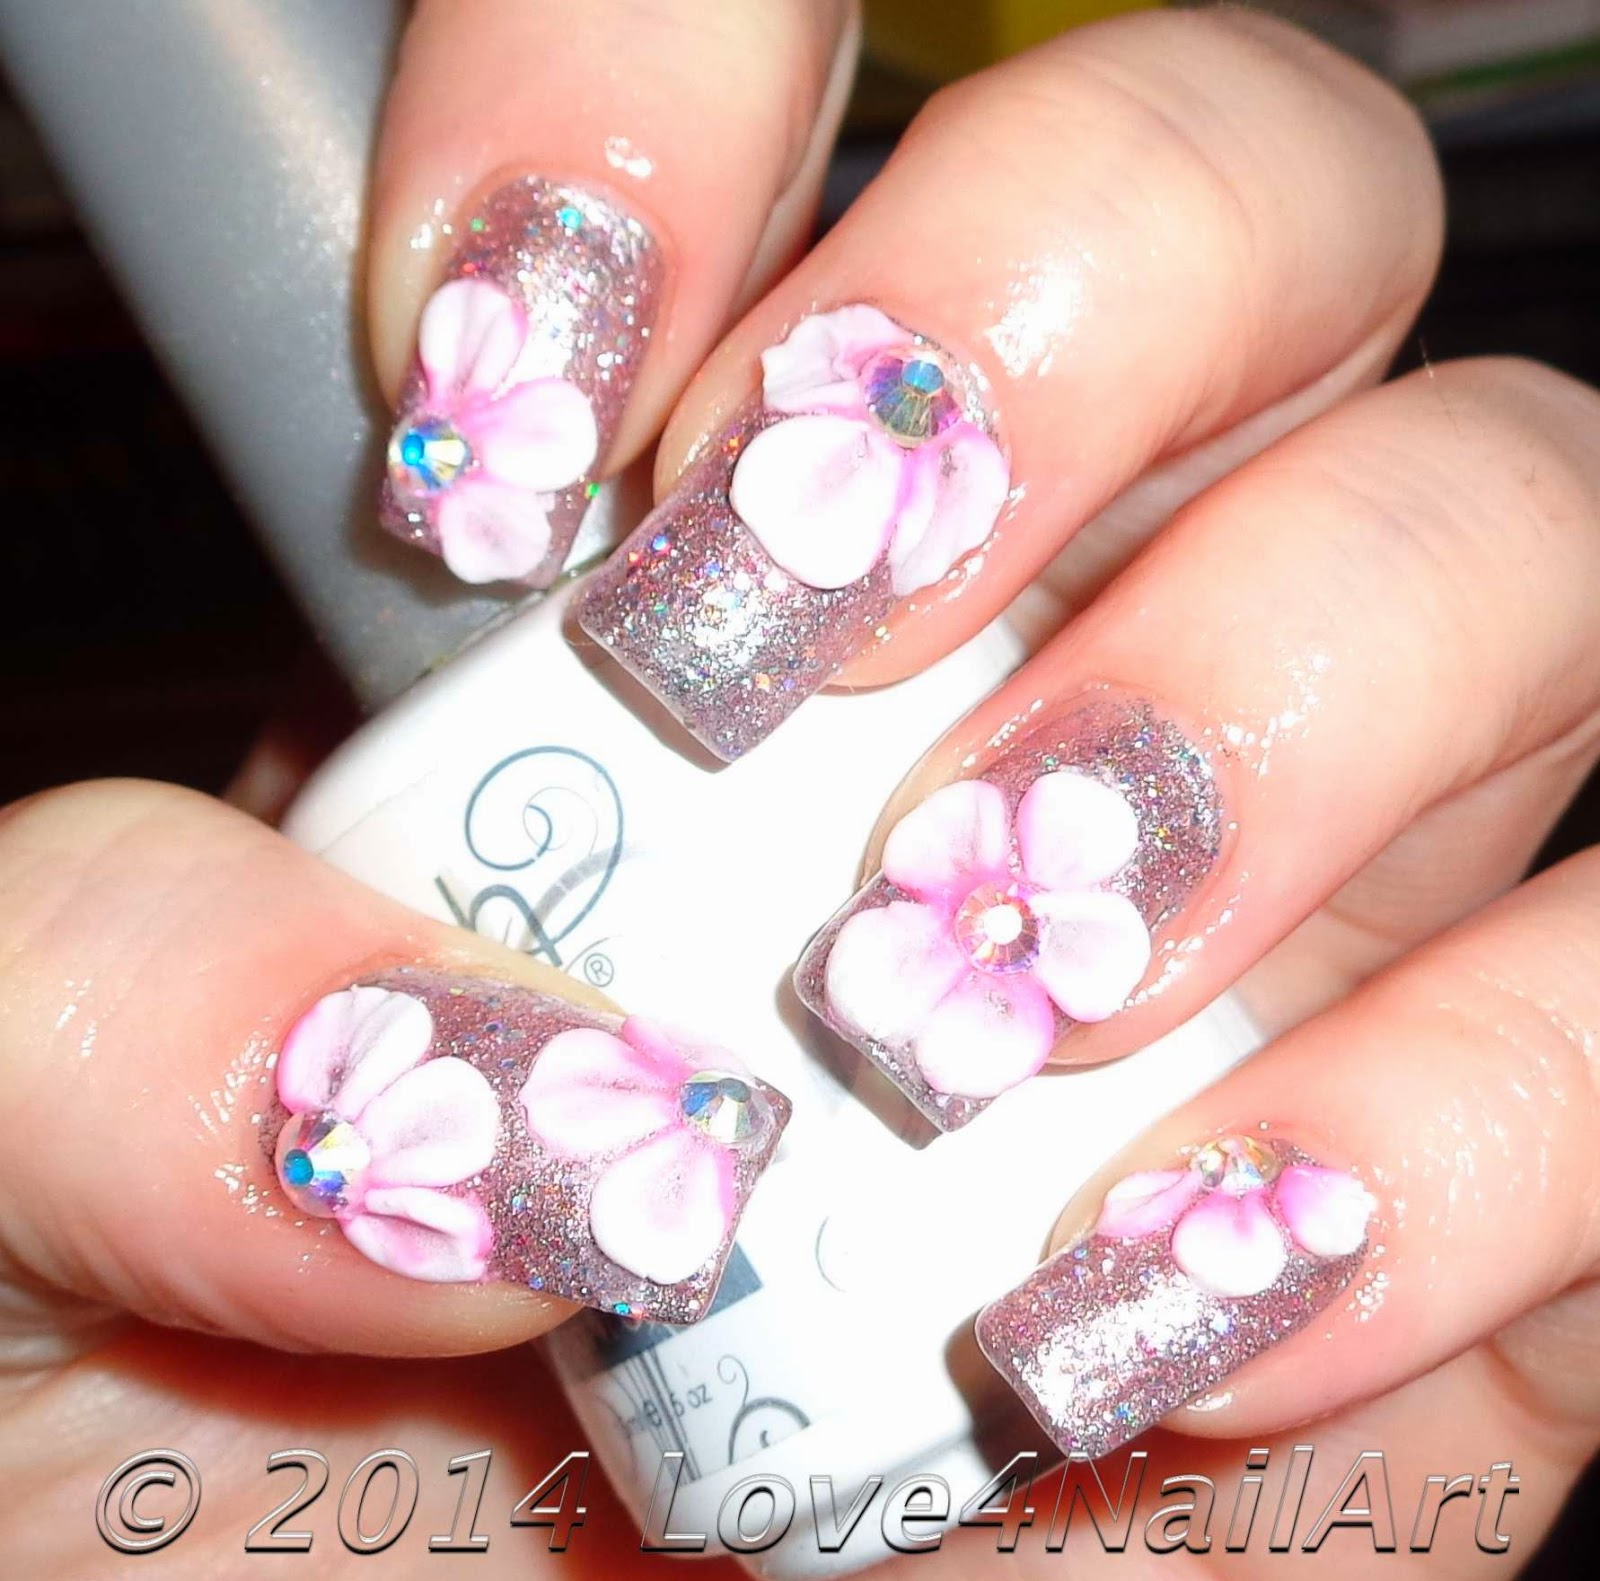 Love4NailArt: Two Toned 3d Flower Nail Art Design Idea